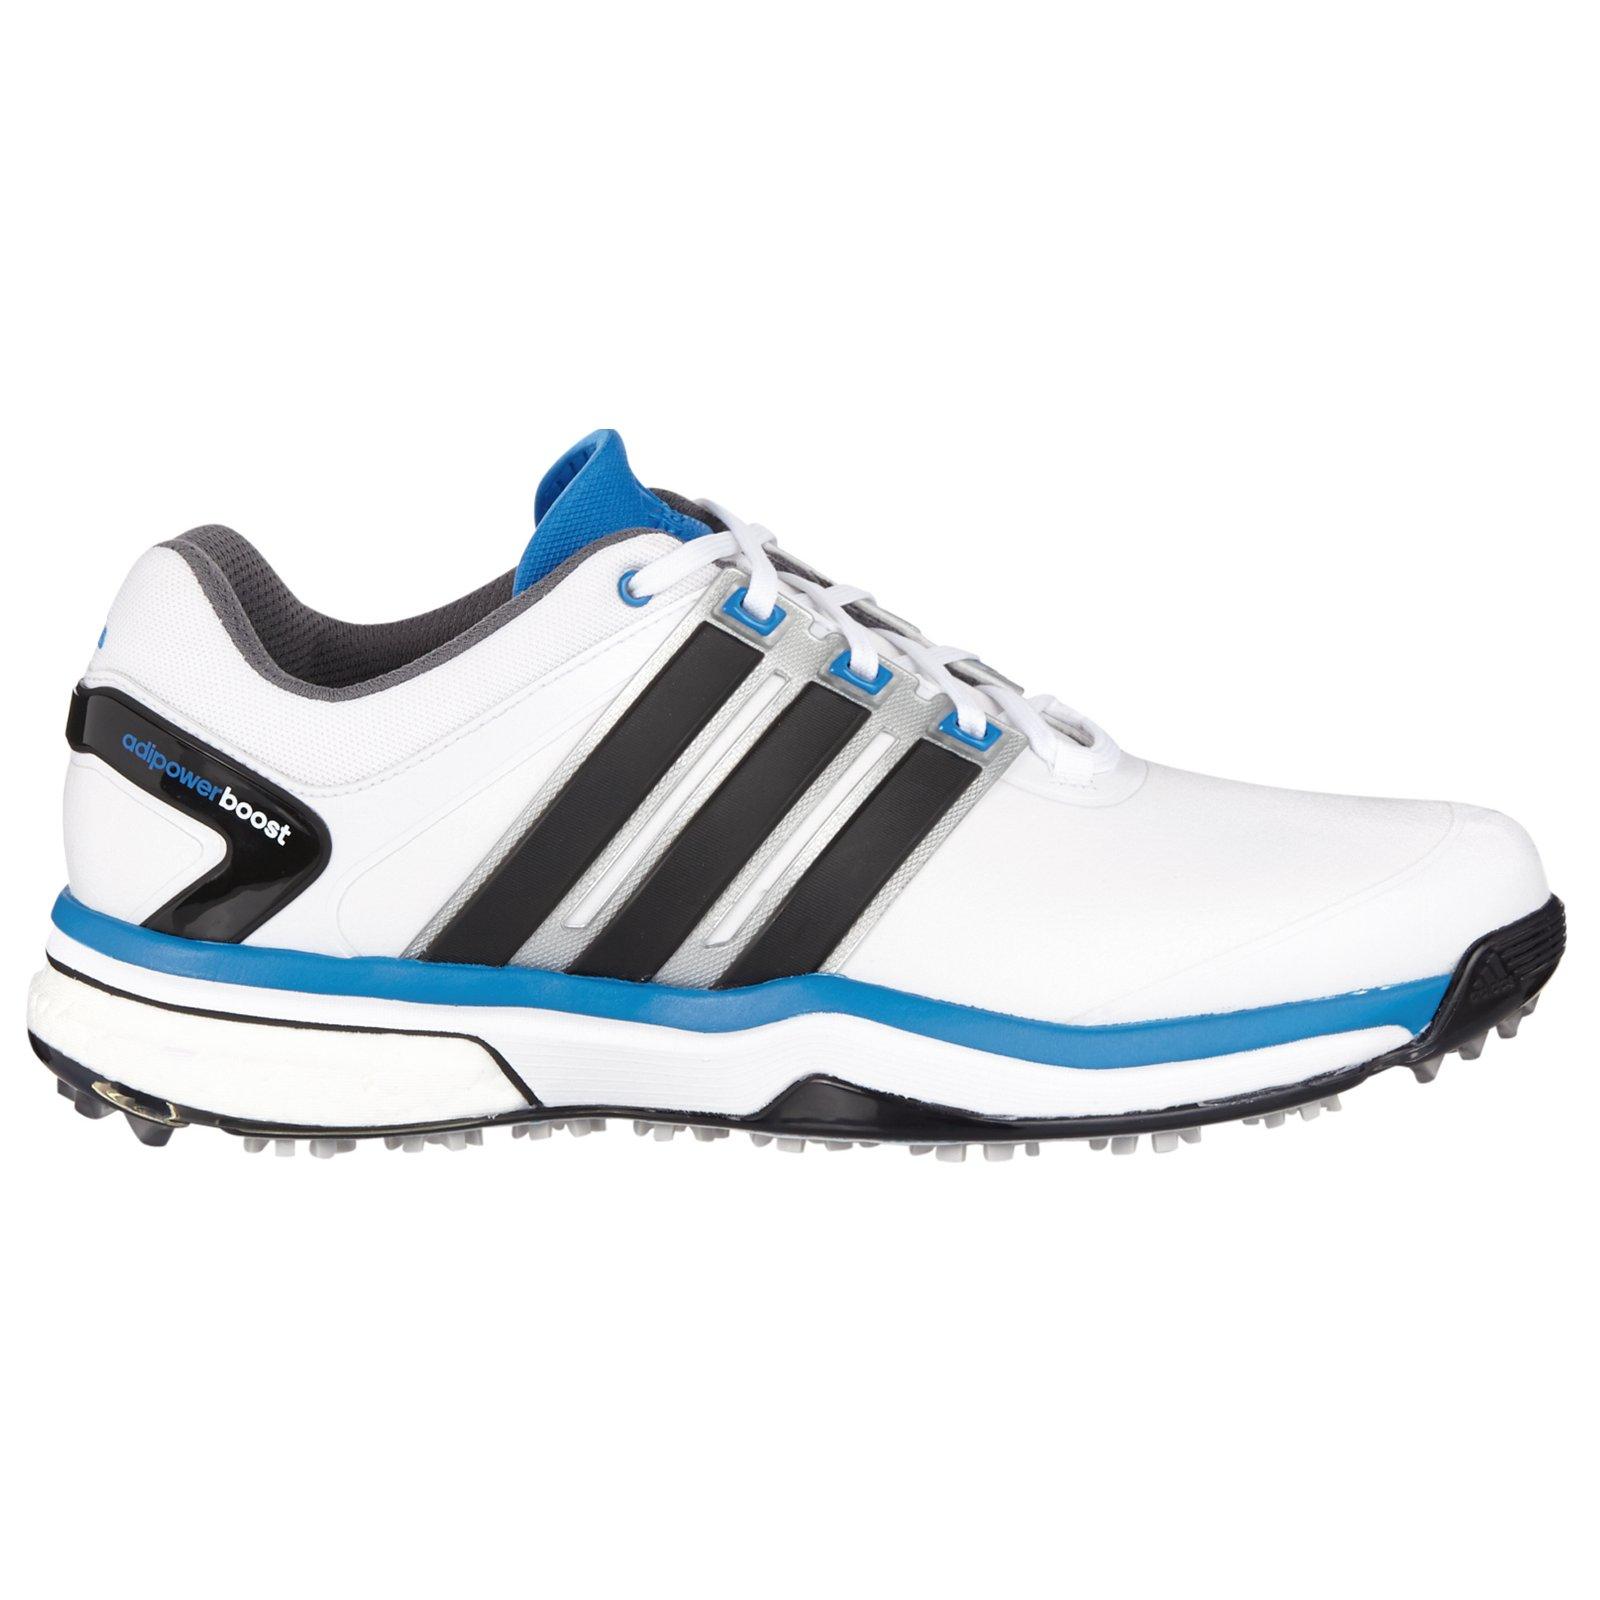 ADIDAS Adipower Boost Golf shoes 2015 - O'Dwyers Golf Store : O